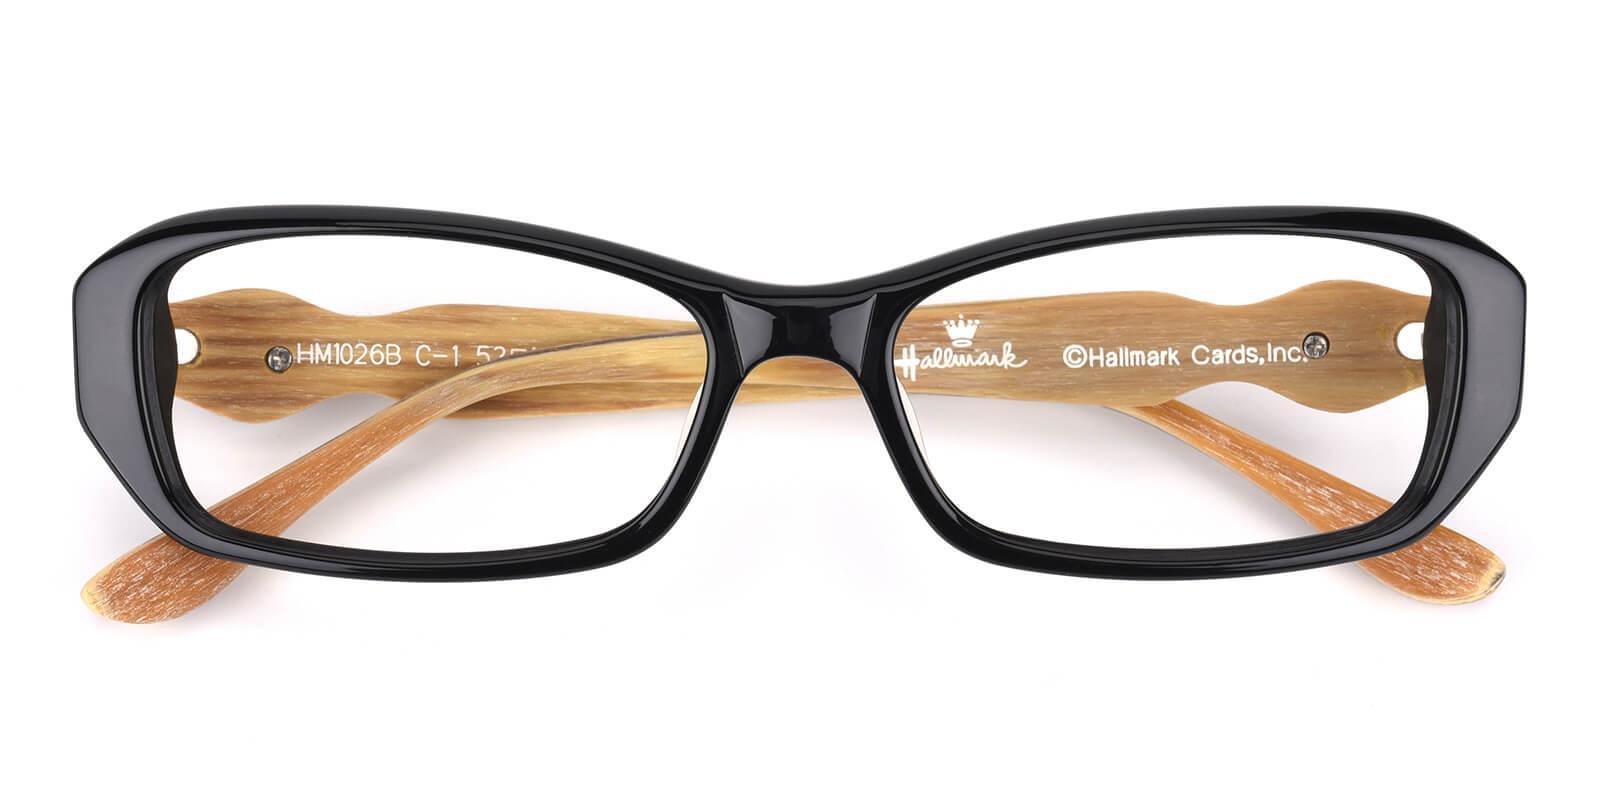 Robion-Black-Rectangle-Acetate-Eyeglasses-detail